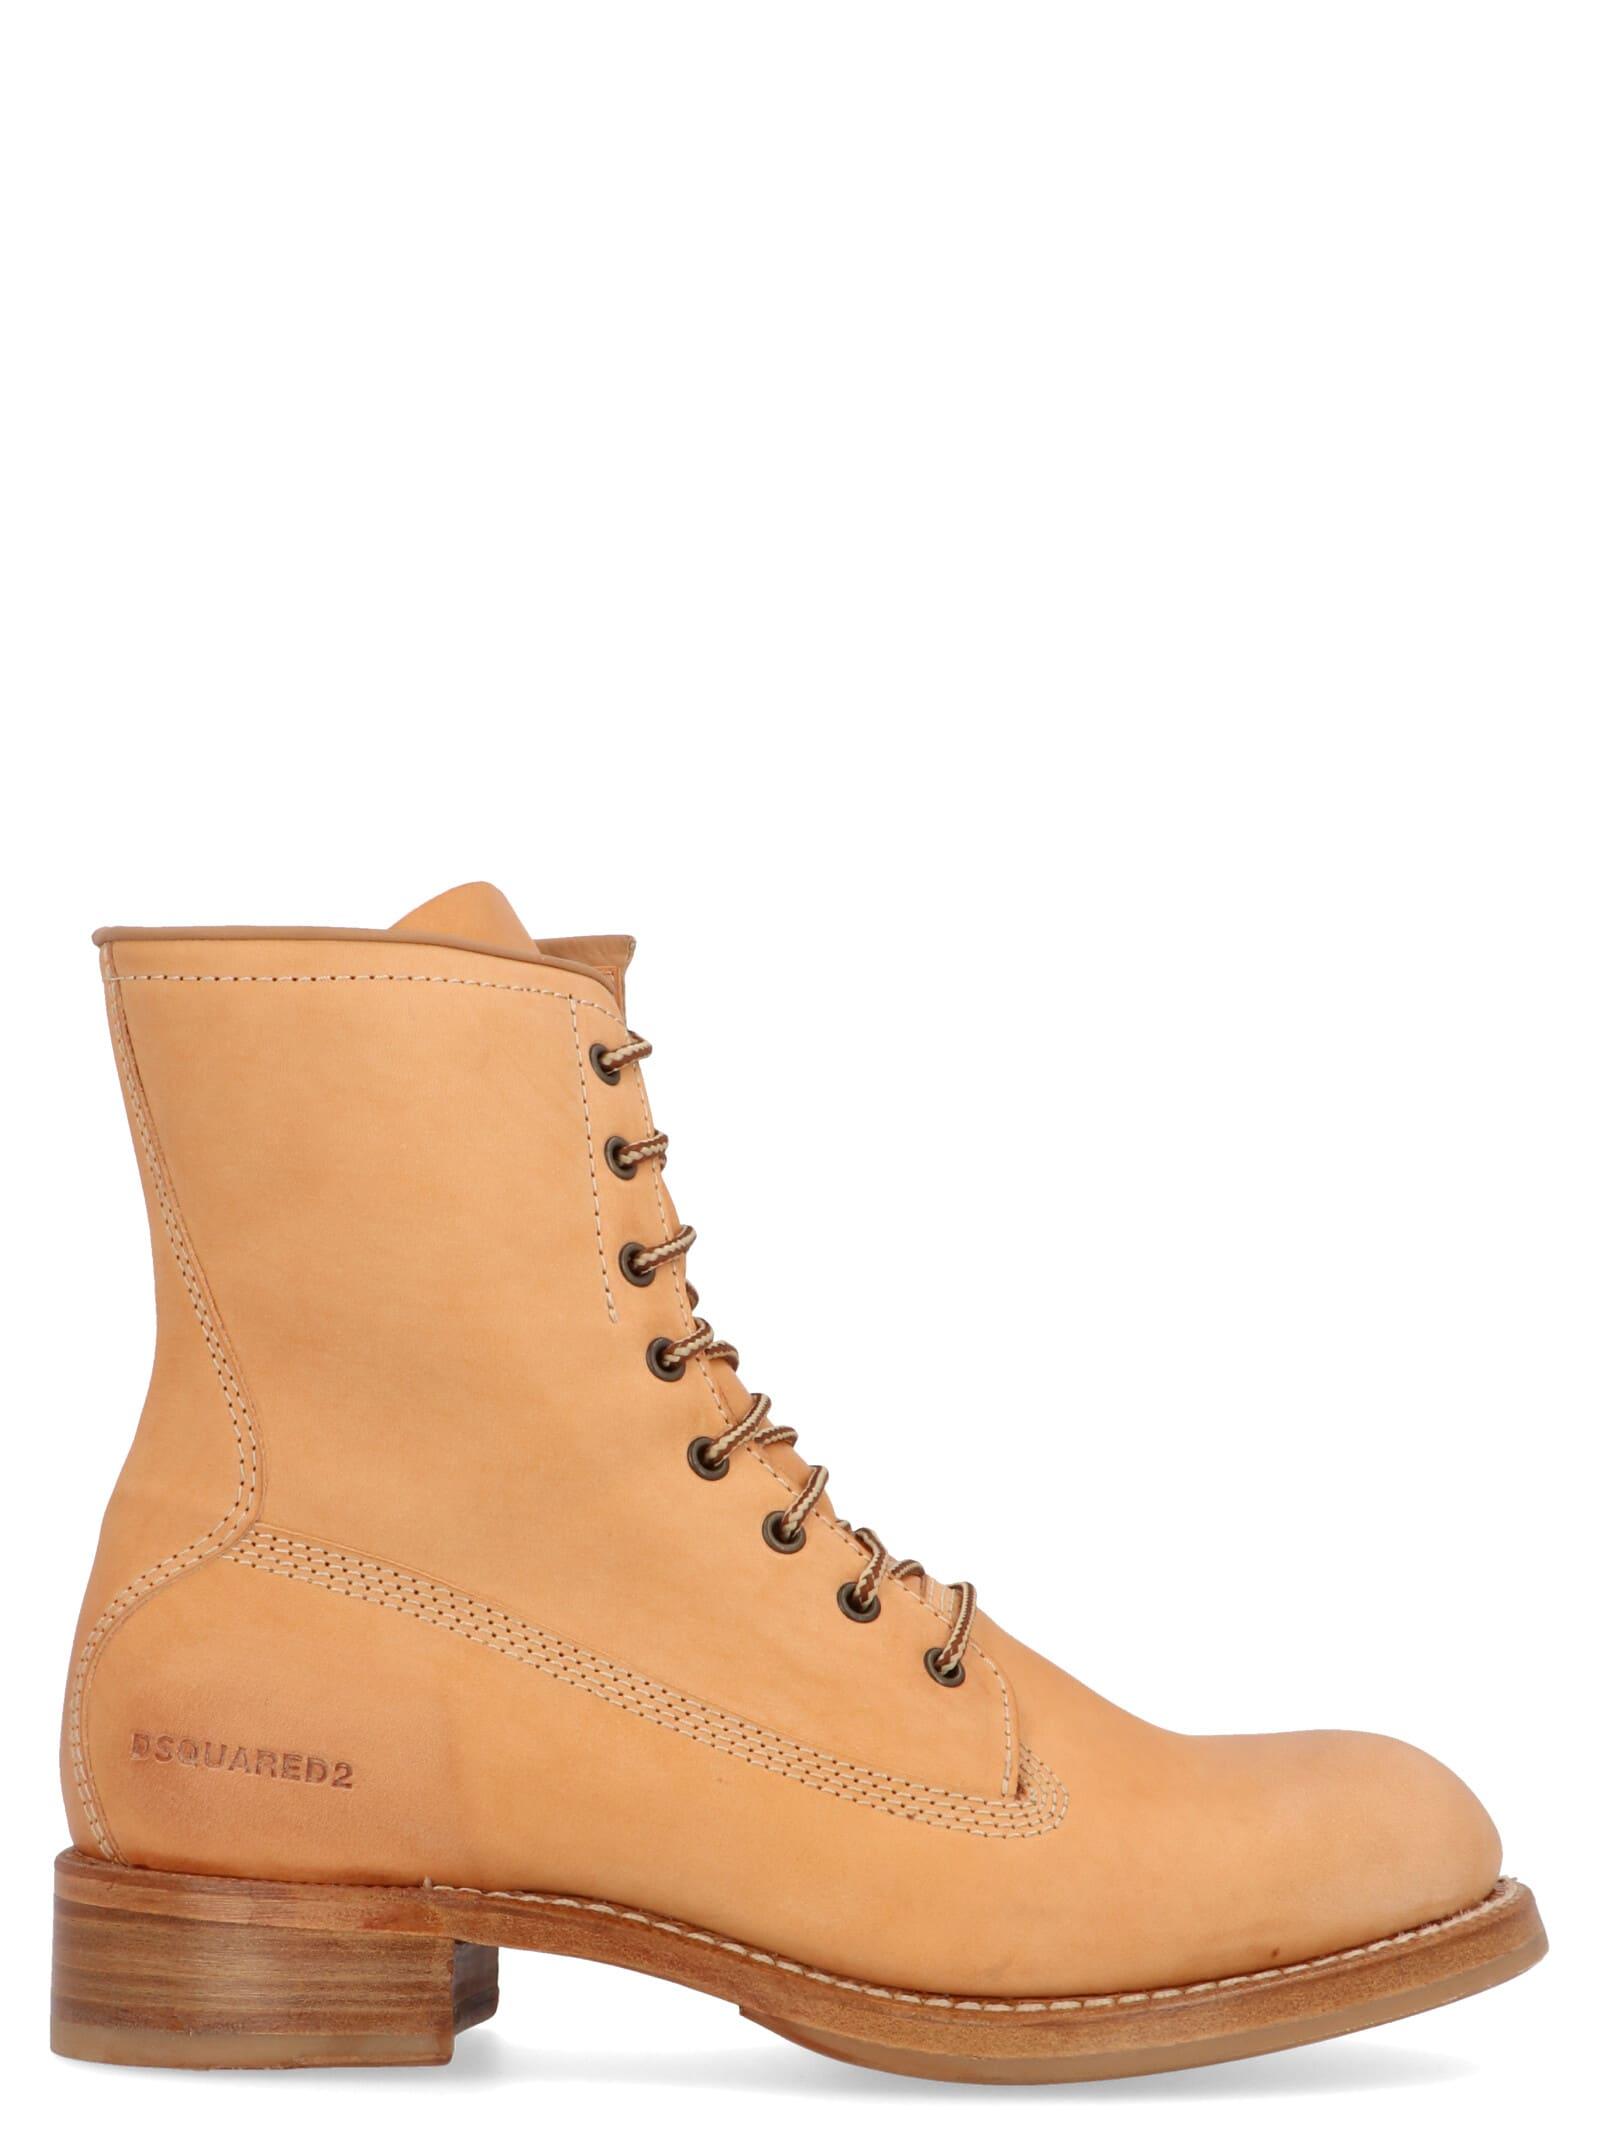 Dsquared2 yukon Shoes